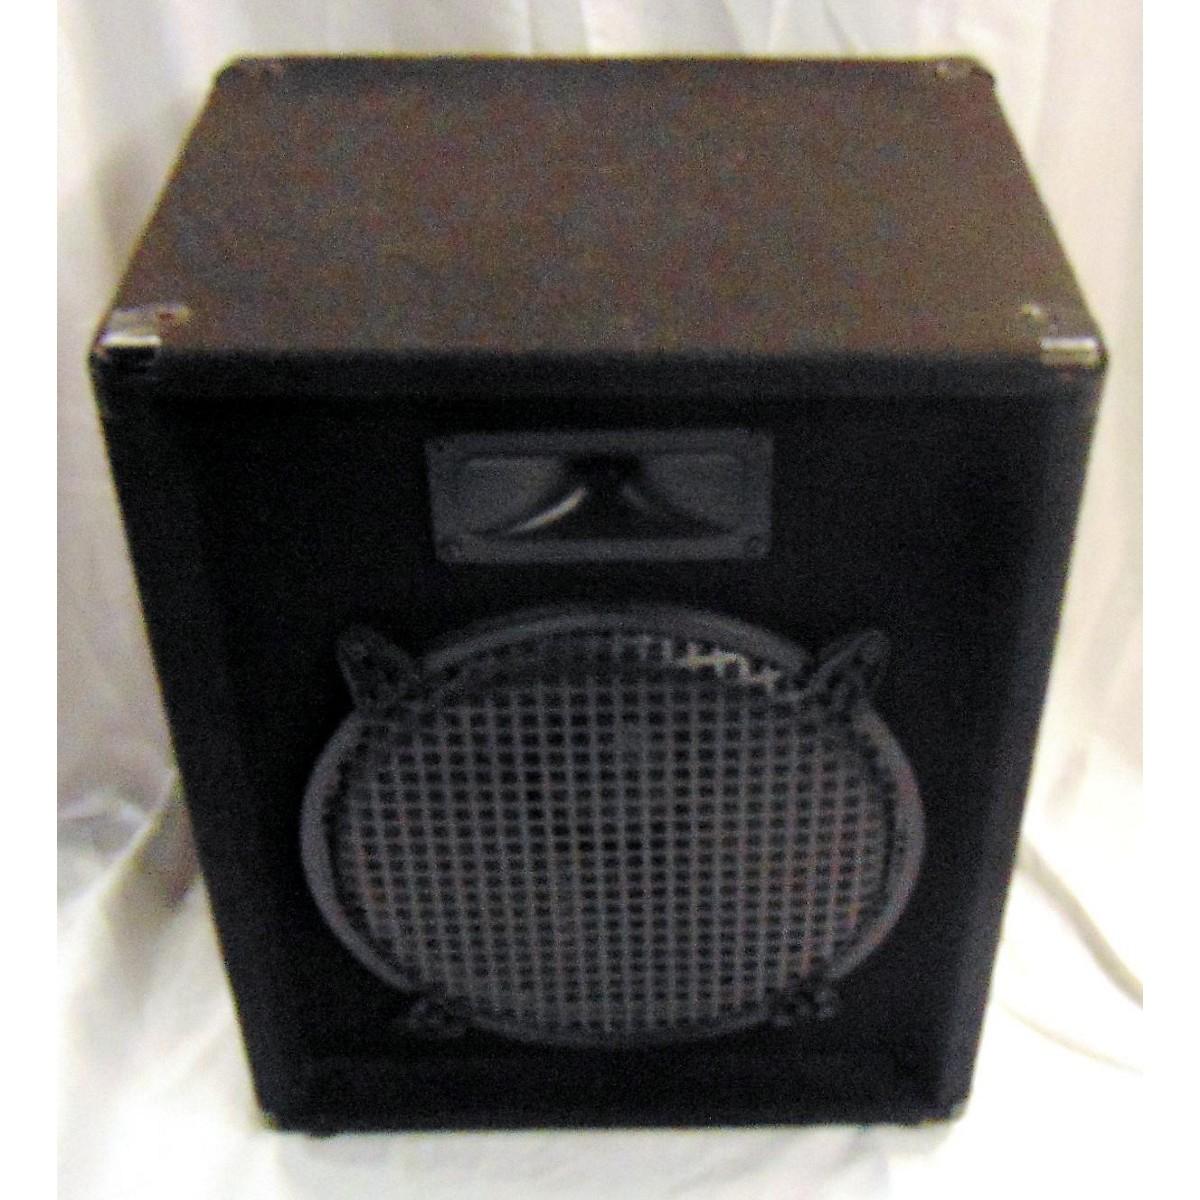 Miscellaneous MNP-P-12 12IN Unpowered Speaker